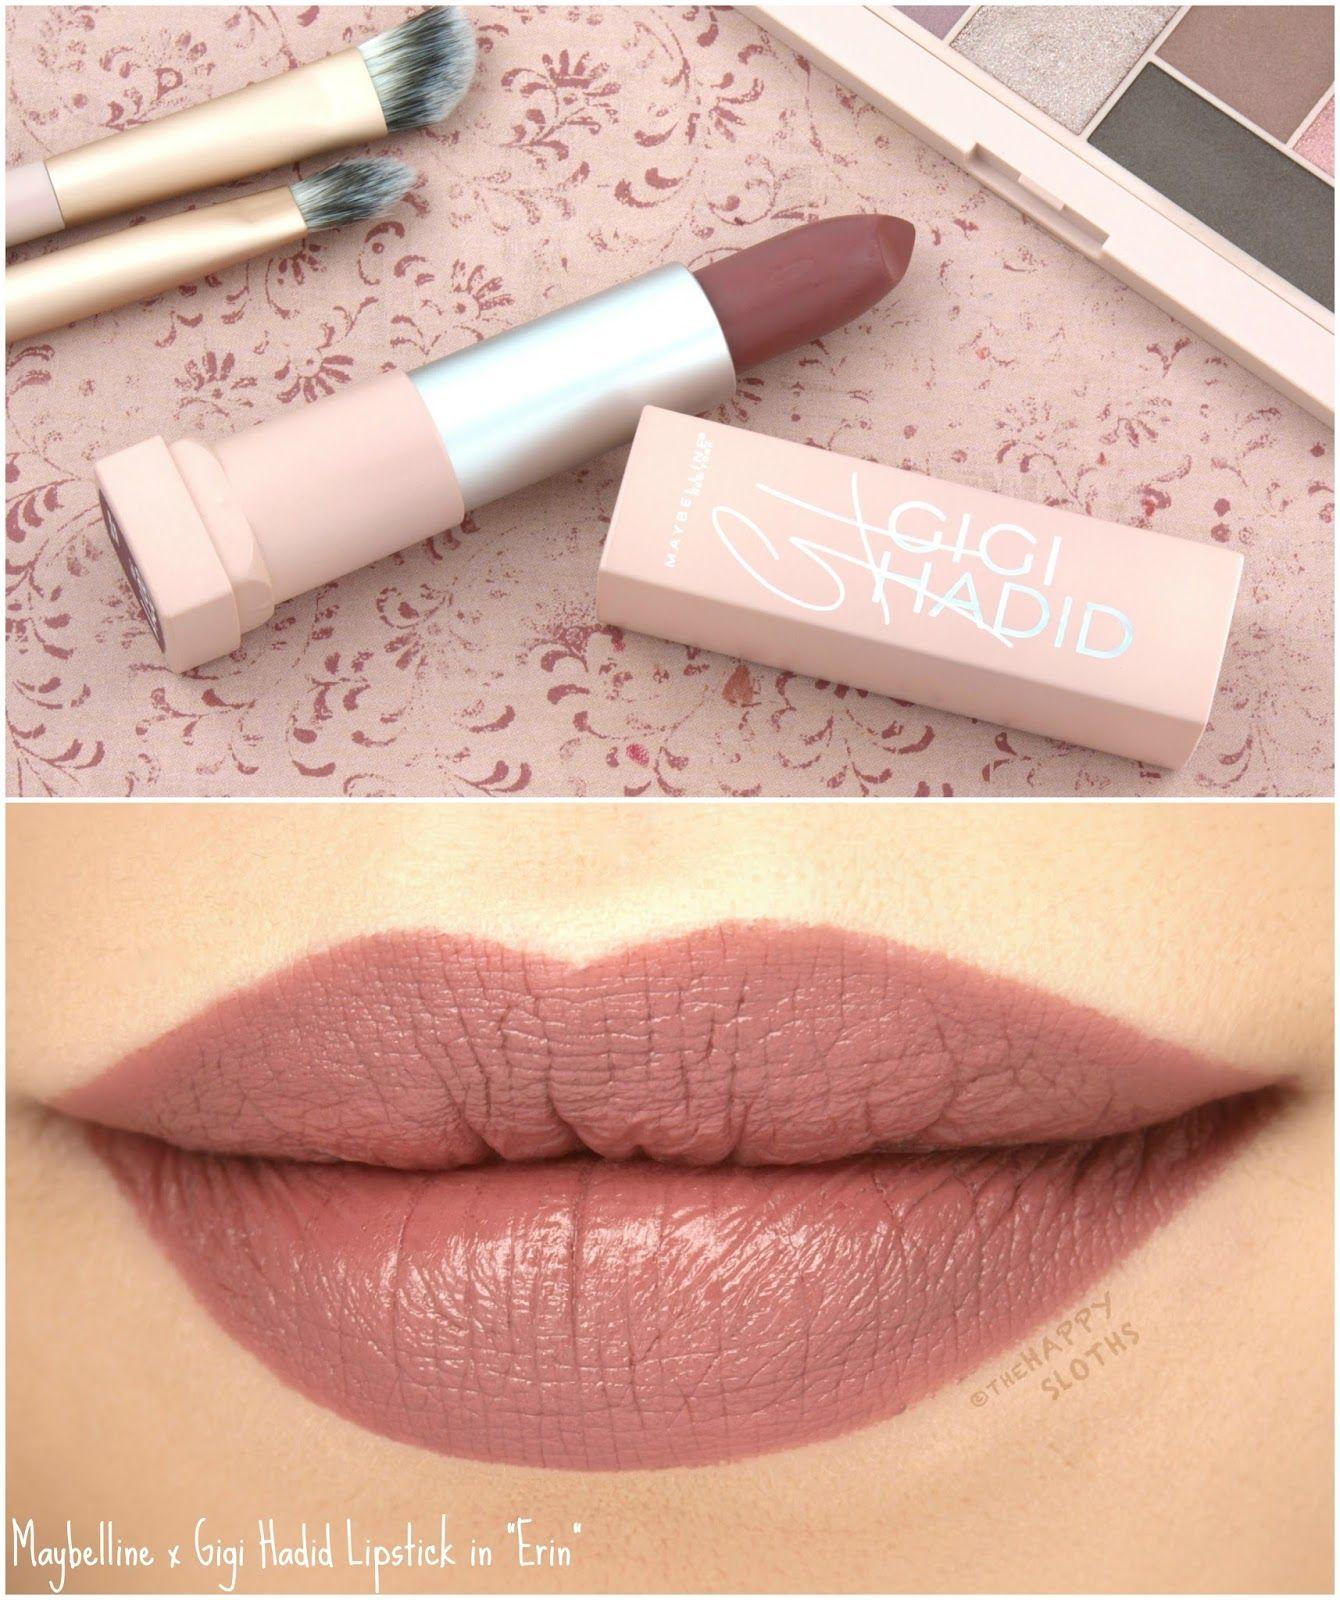 c08a43039f0 Maybelline x Gigi Hadid Lipstick in